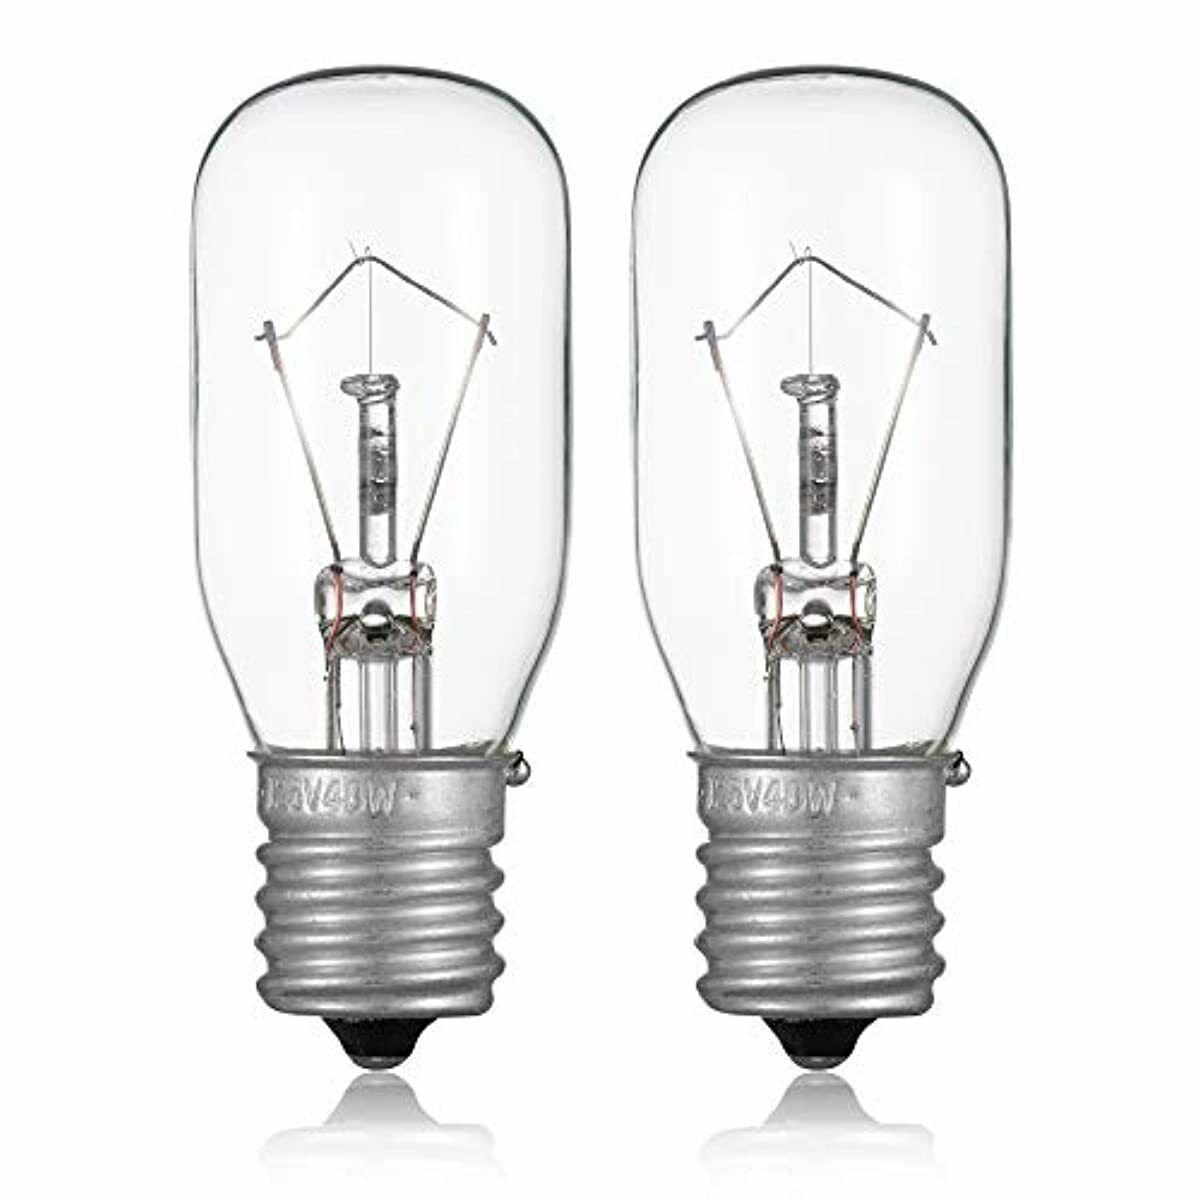 2pcs Microwave Bulb Ge Wb36x 125v 40w Incandescent